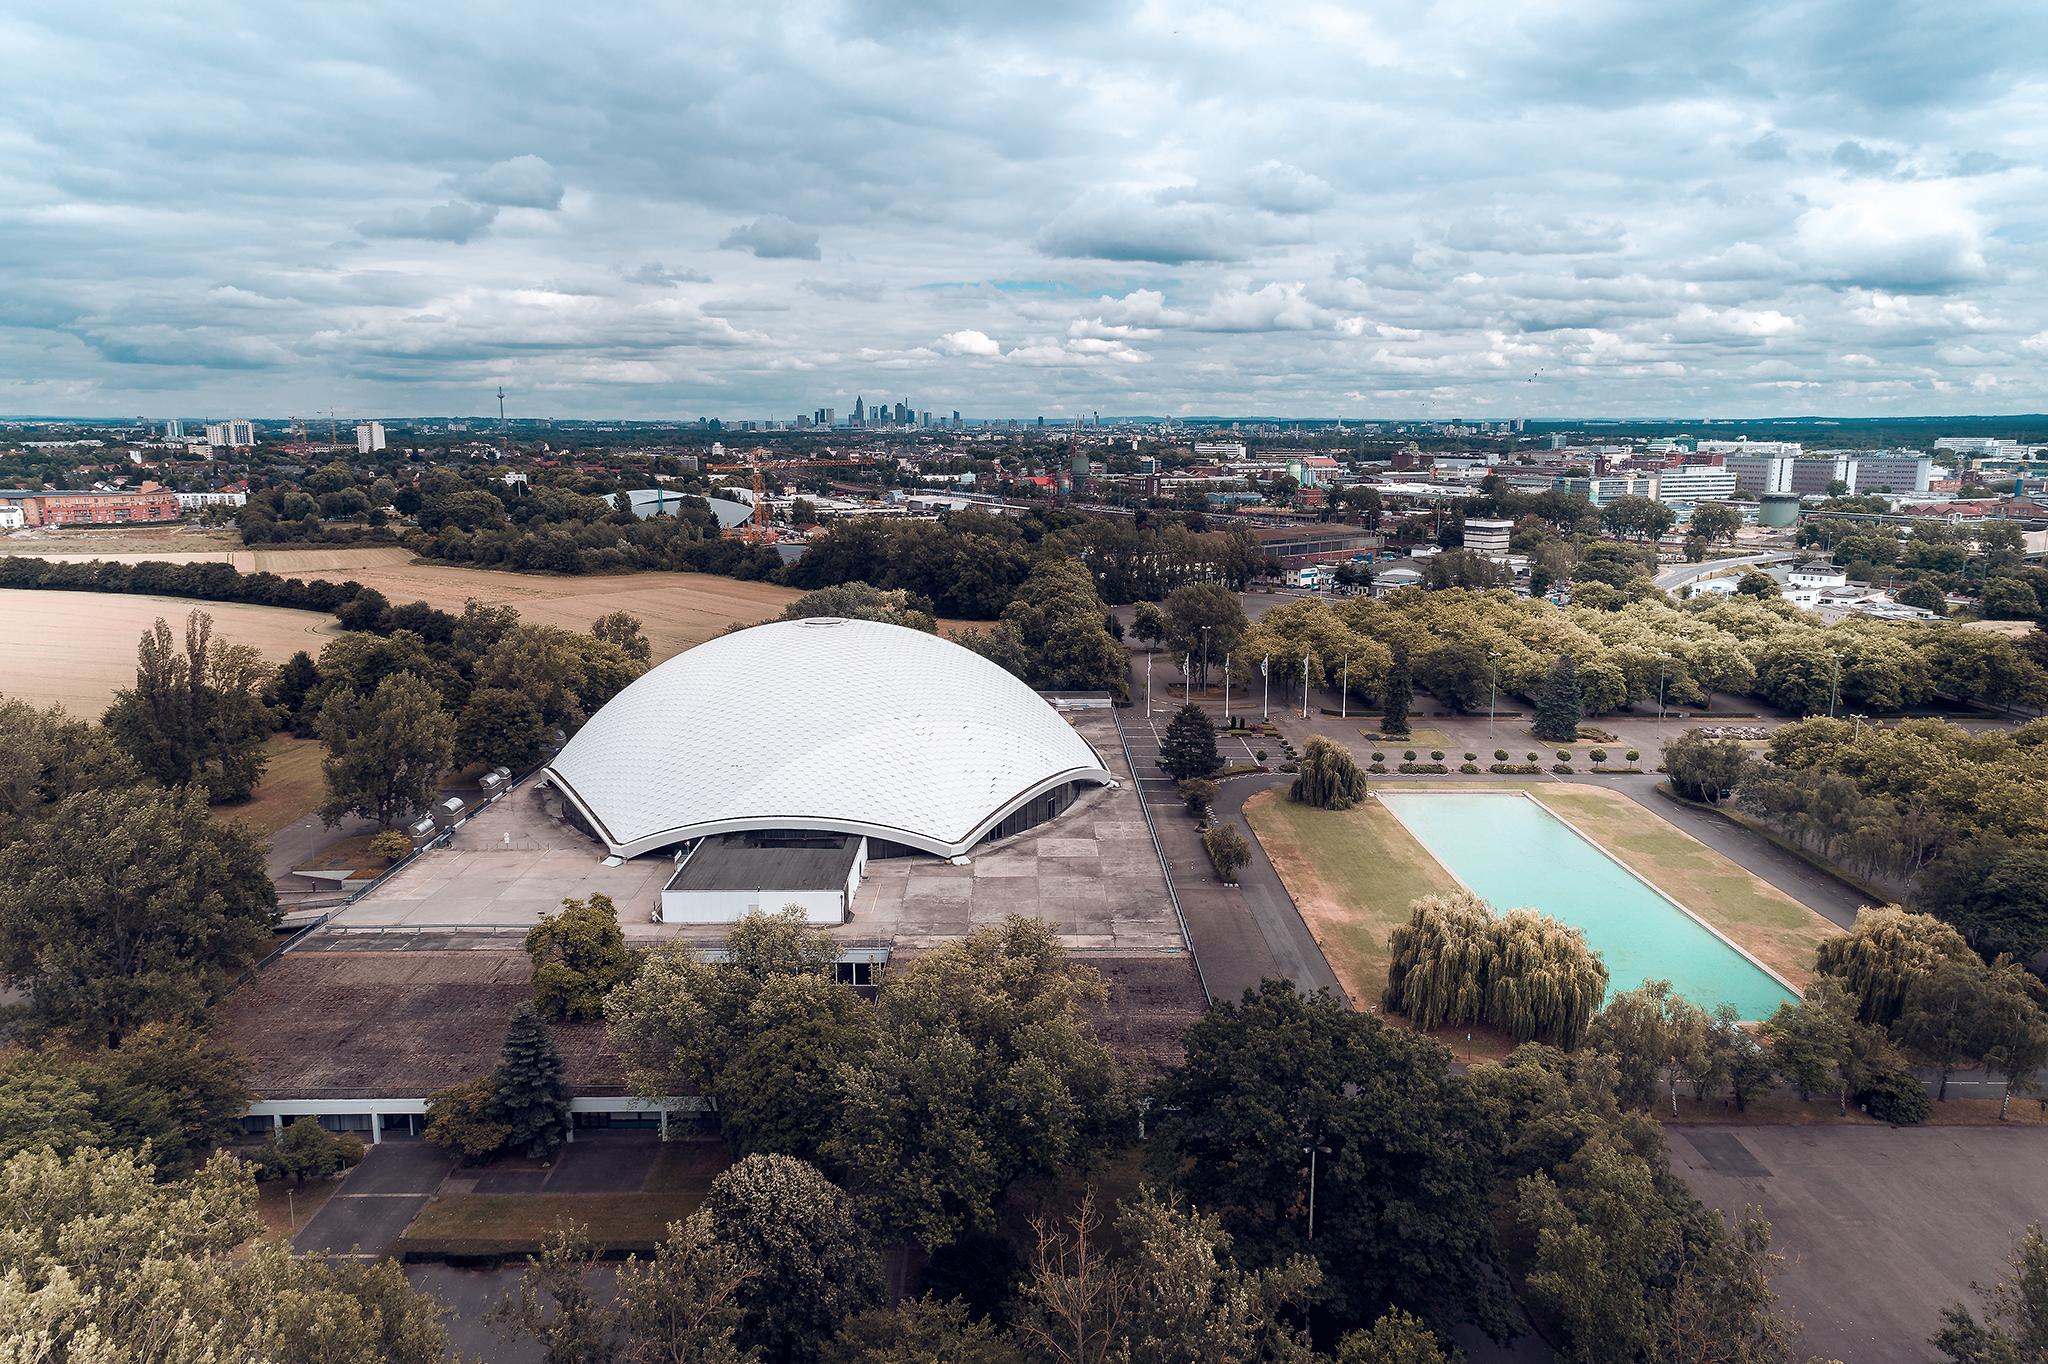 Jahrunderthalle Frankfurt Luftbildaufnahme drohne